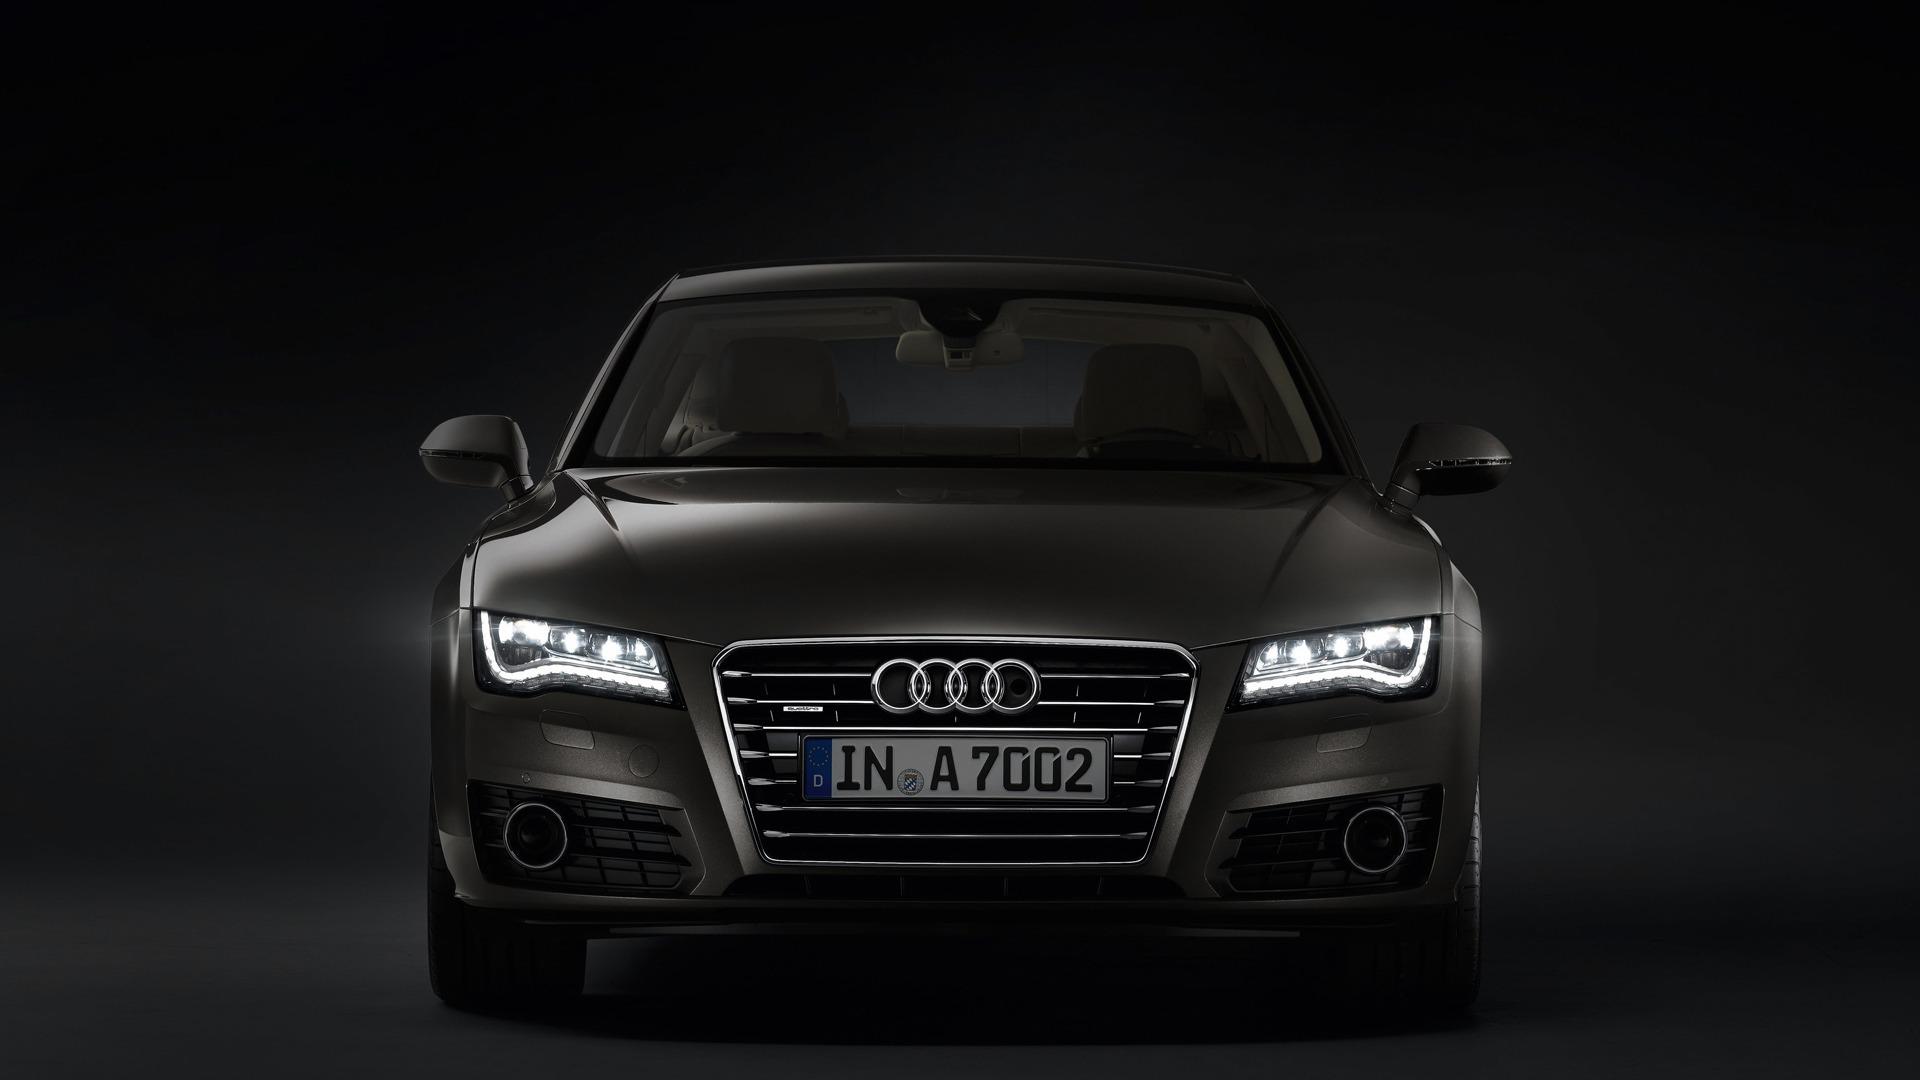 Audi a7 wallpaper 1920x1080